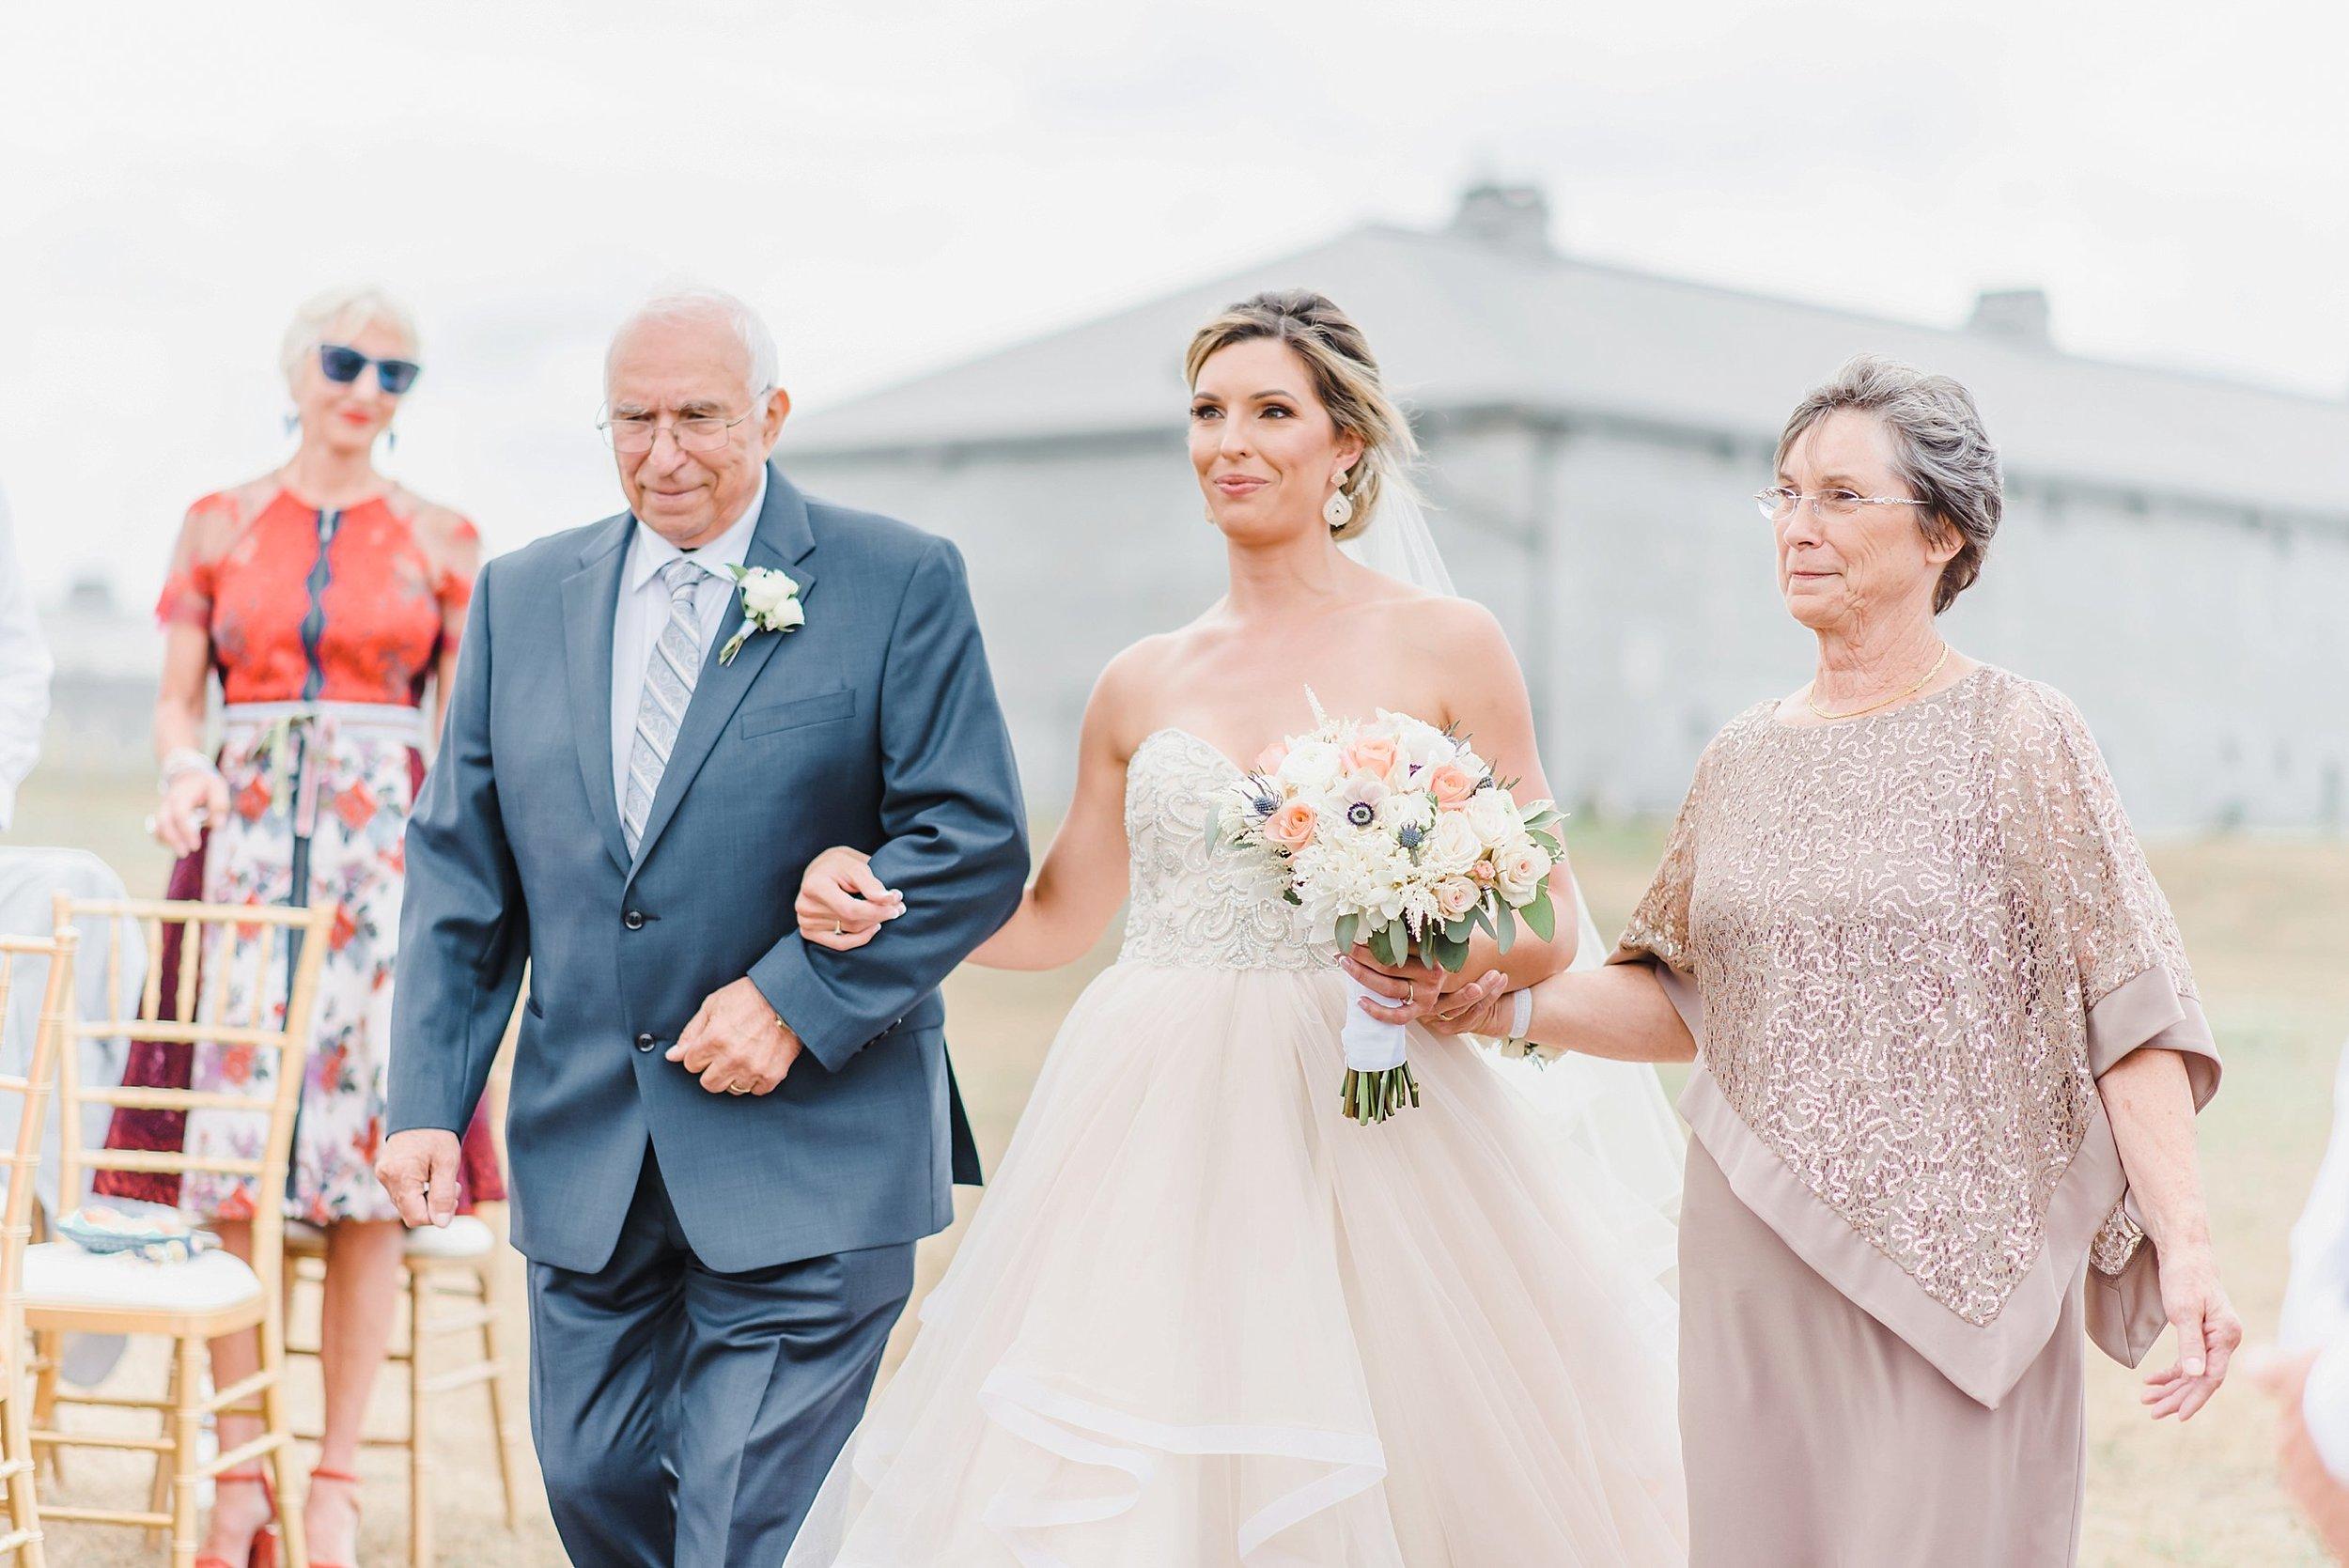 light airy indie fine art ottawa wedding photographer | Ali and Batoul Photography_0181.jpg